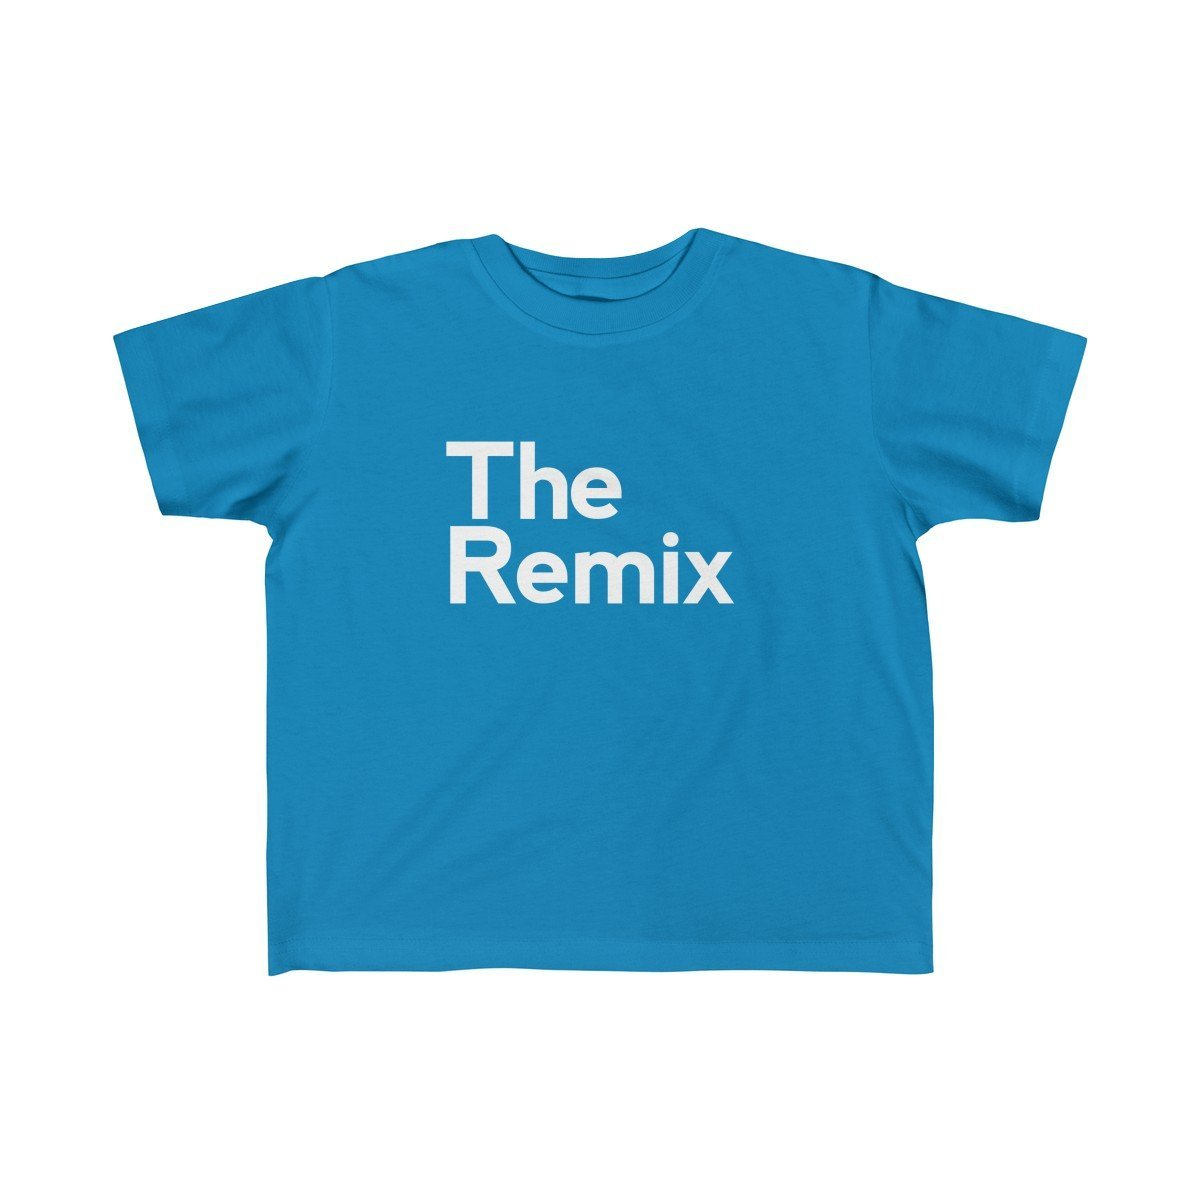 Original Remix Dad and Me Set The Remix Children T-Shirt